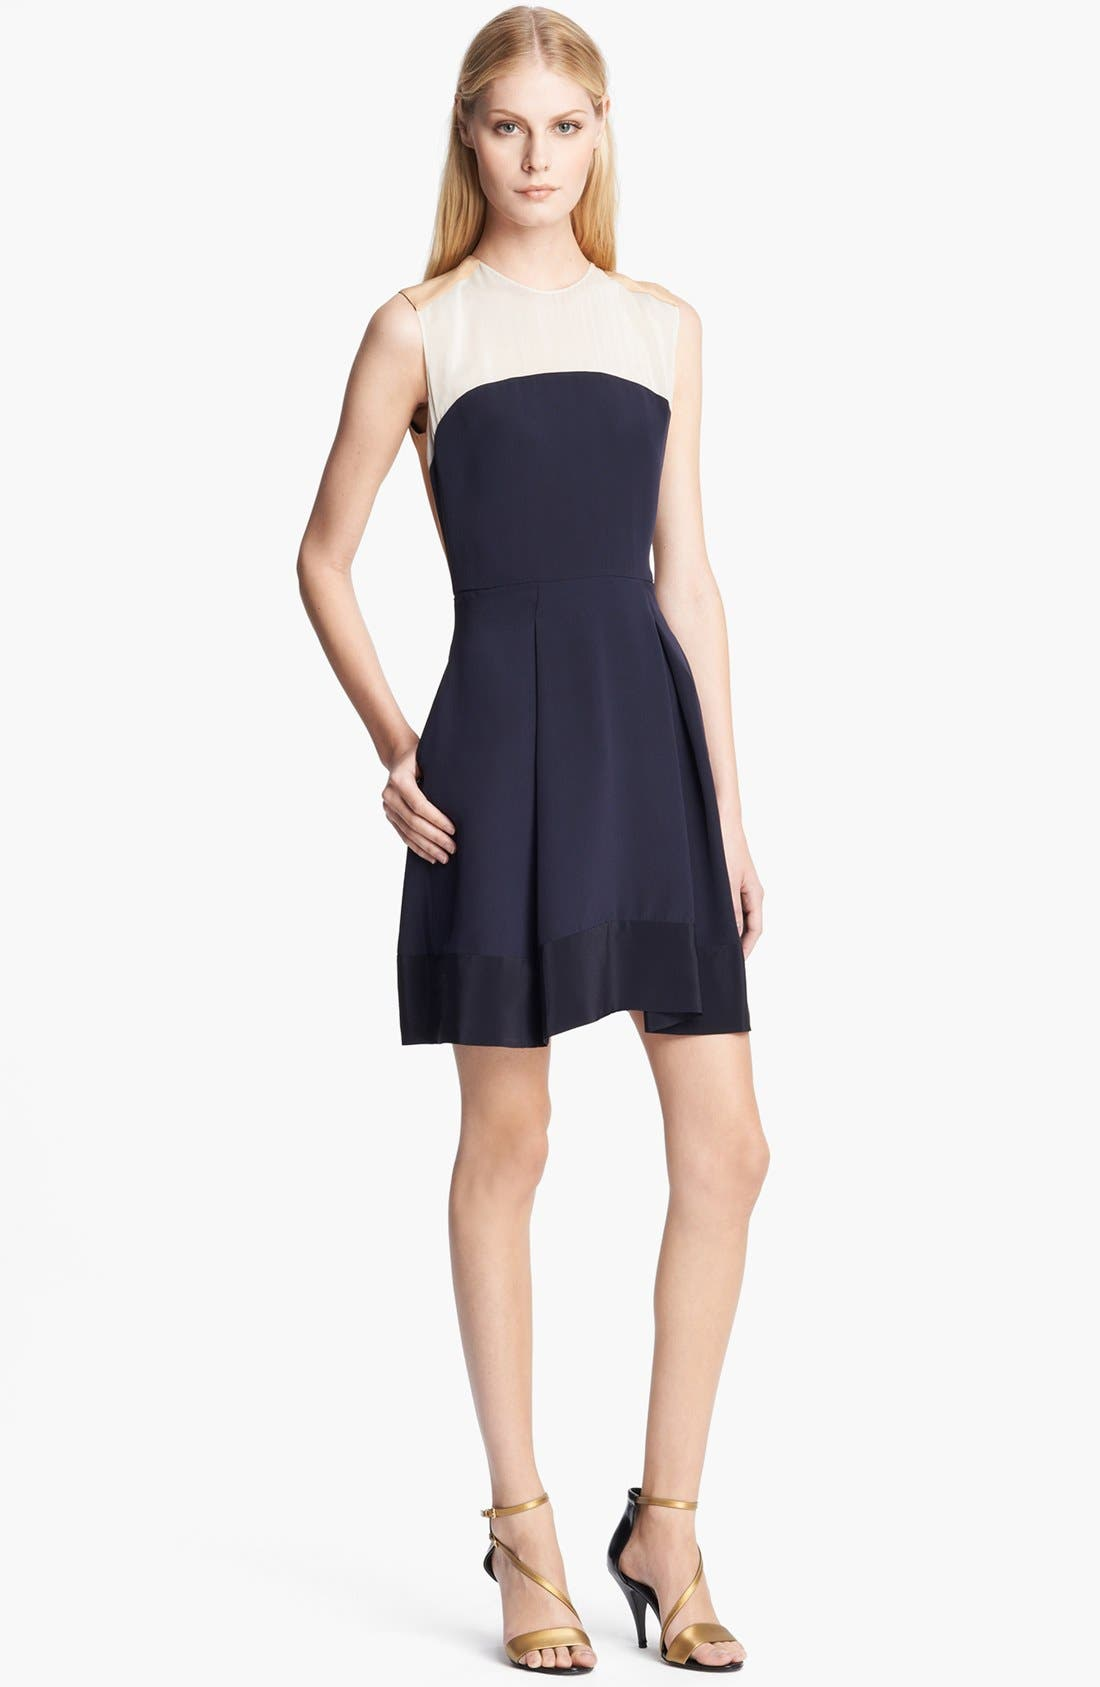 Alternate Image 1 Selected - 3.1 Phillip Lim Contrast Chiffon Yoke Silk Dress